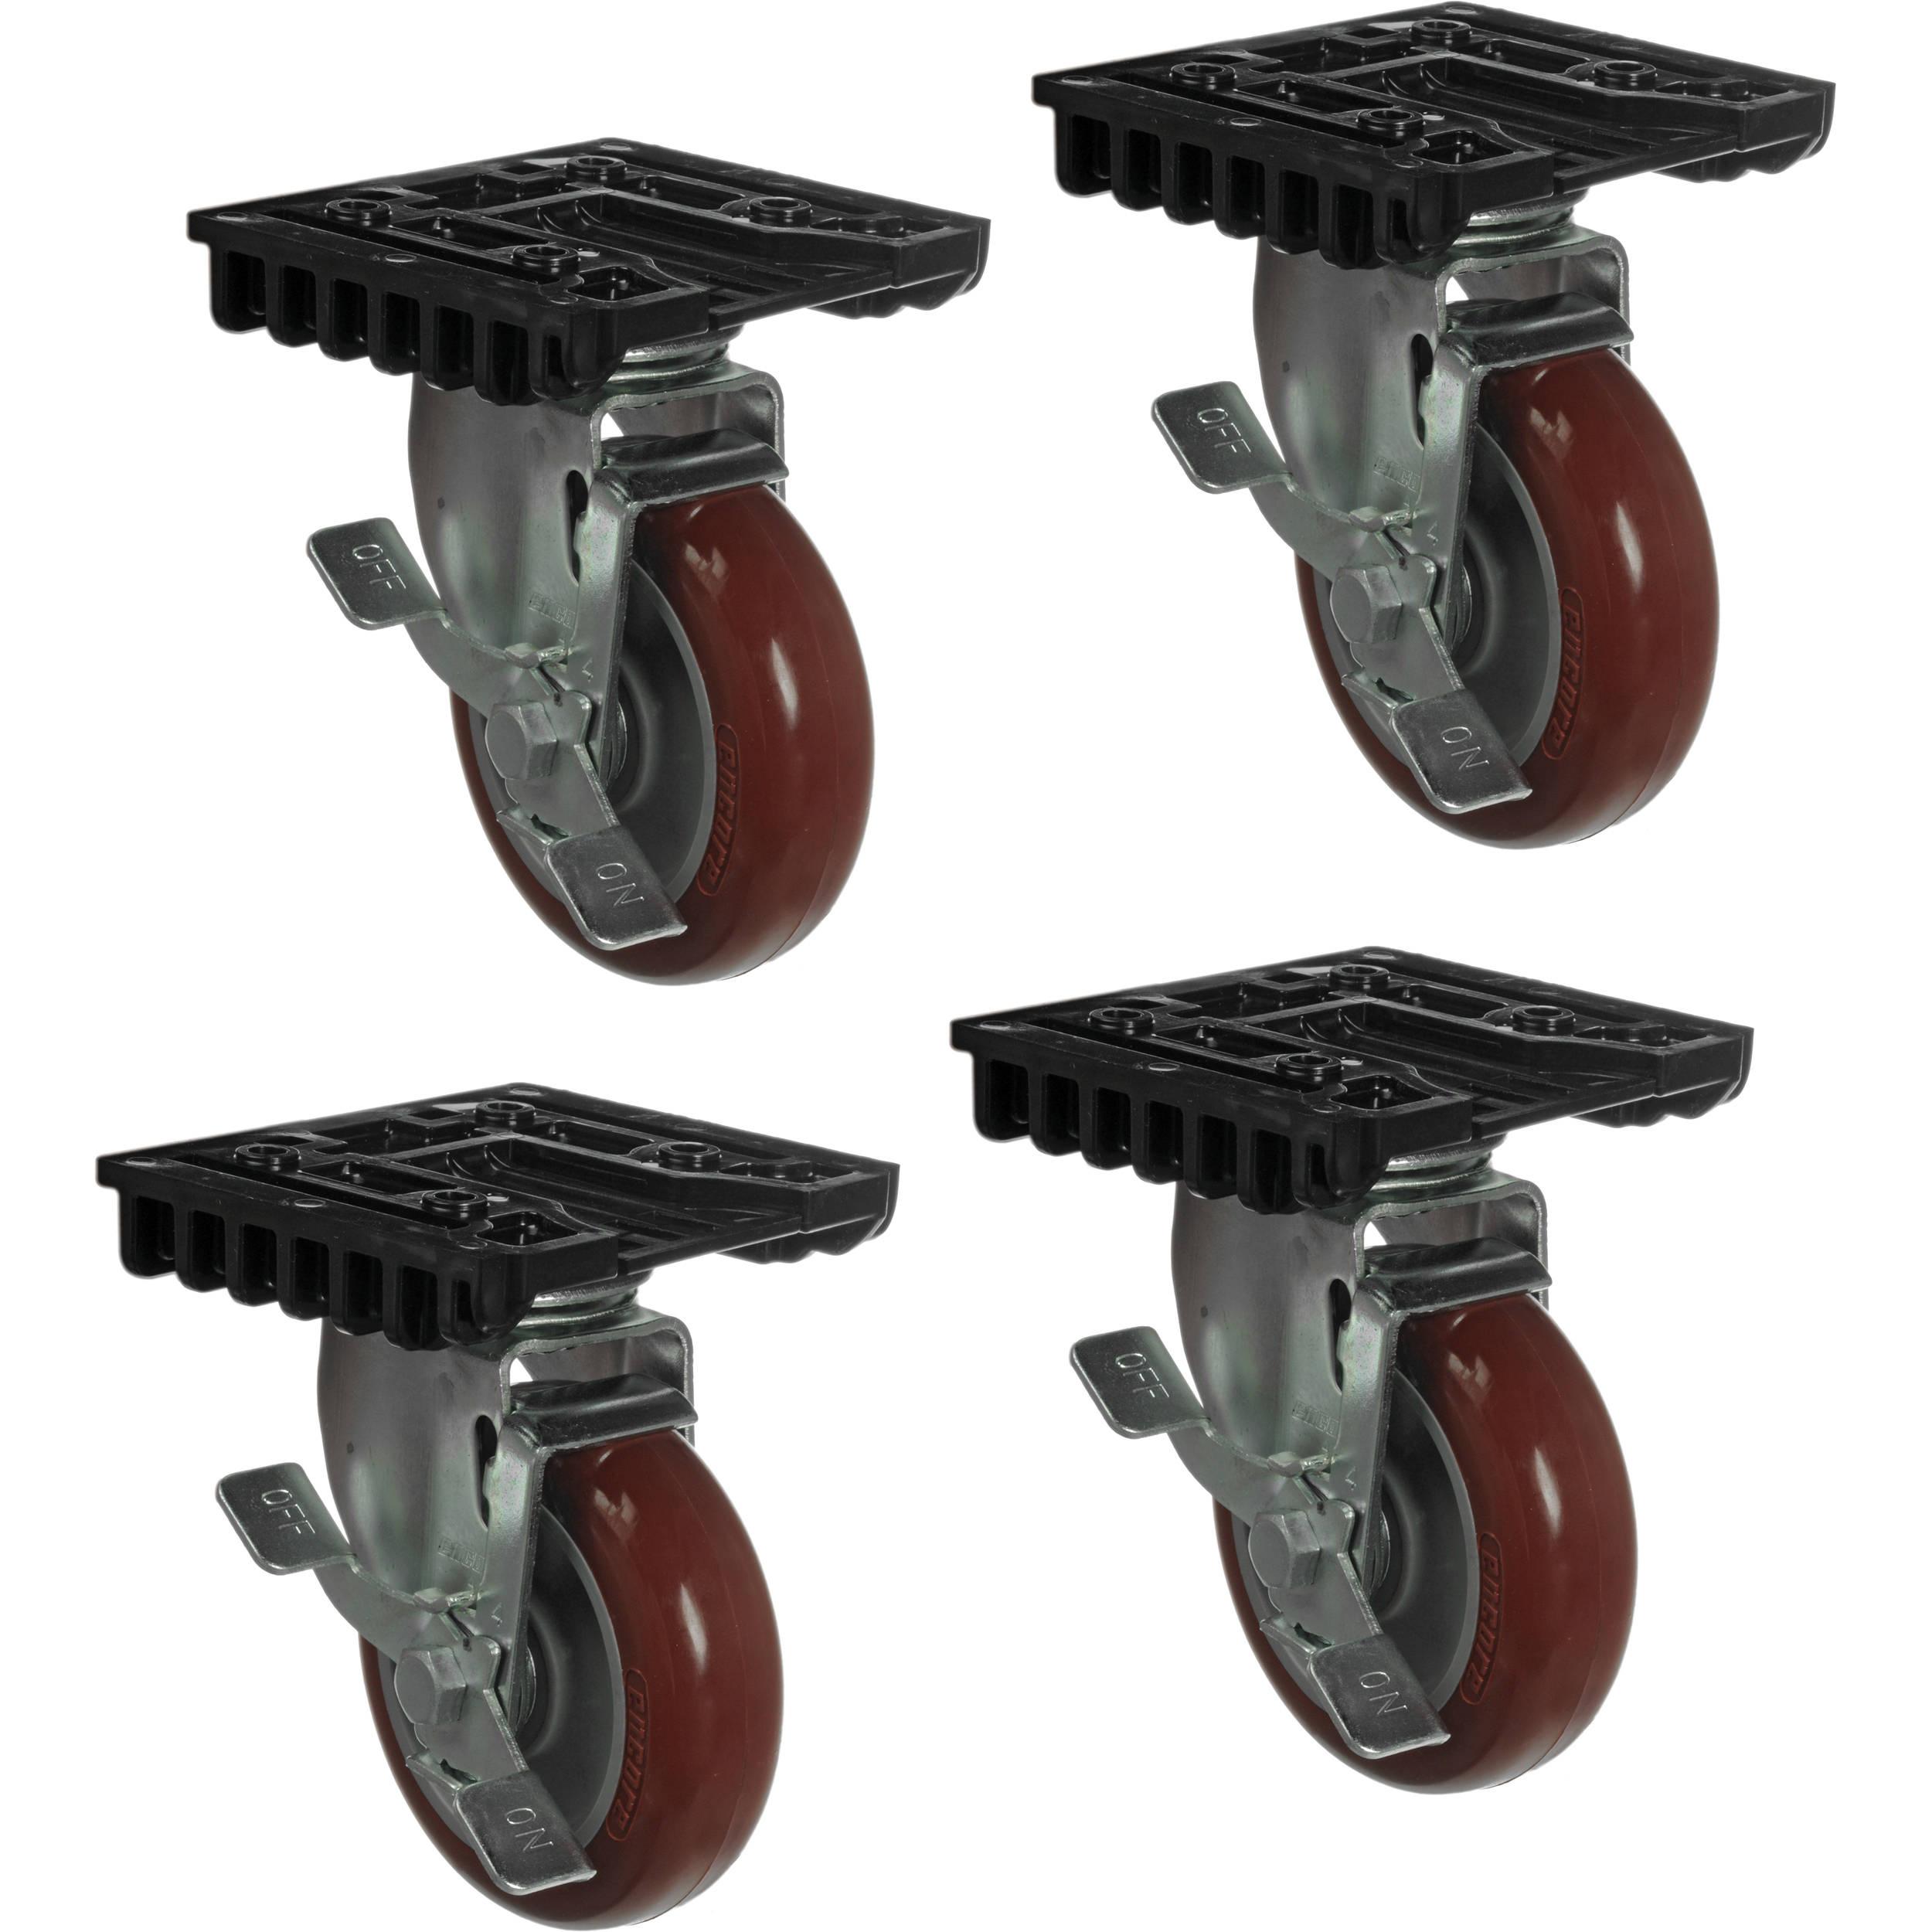 Pelican 0507 Caster Wheel Kit